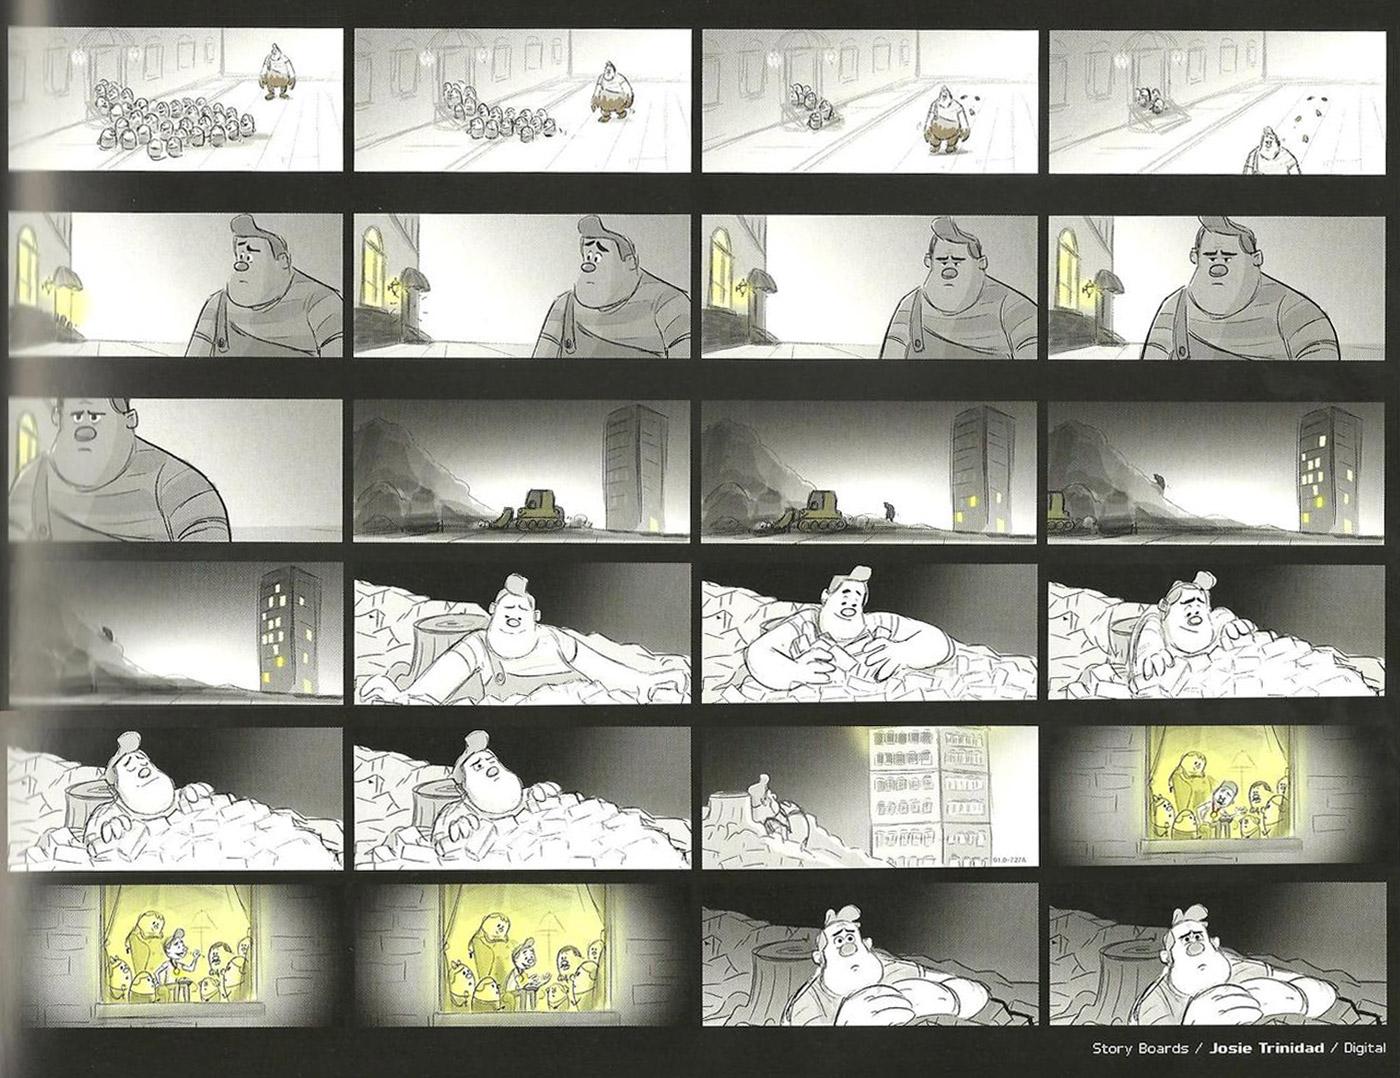 22-The-Art-of-Wreck-It-Ralph-Storyboards-josie-trinidad.jpg